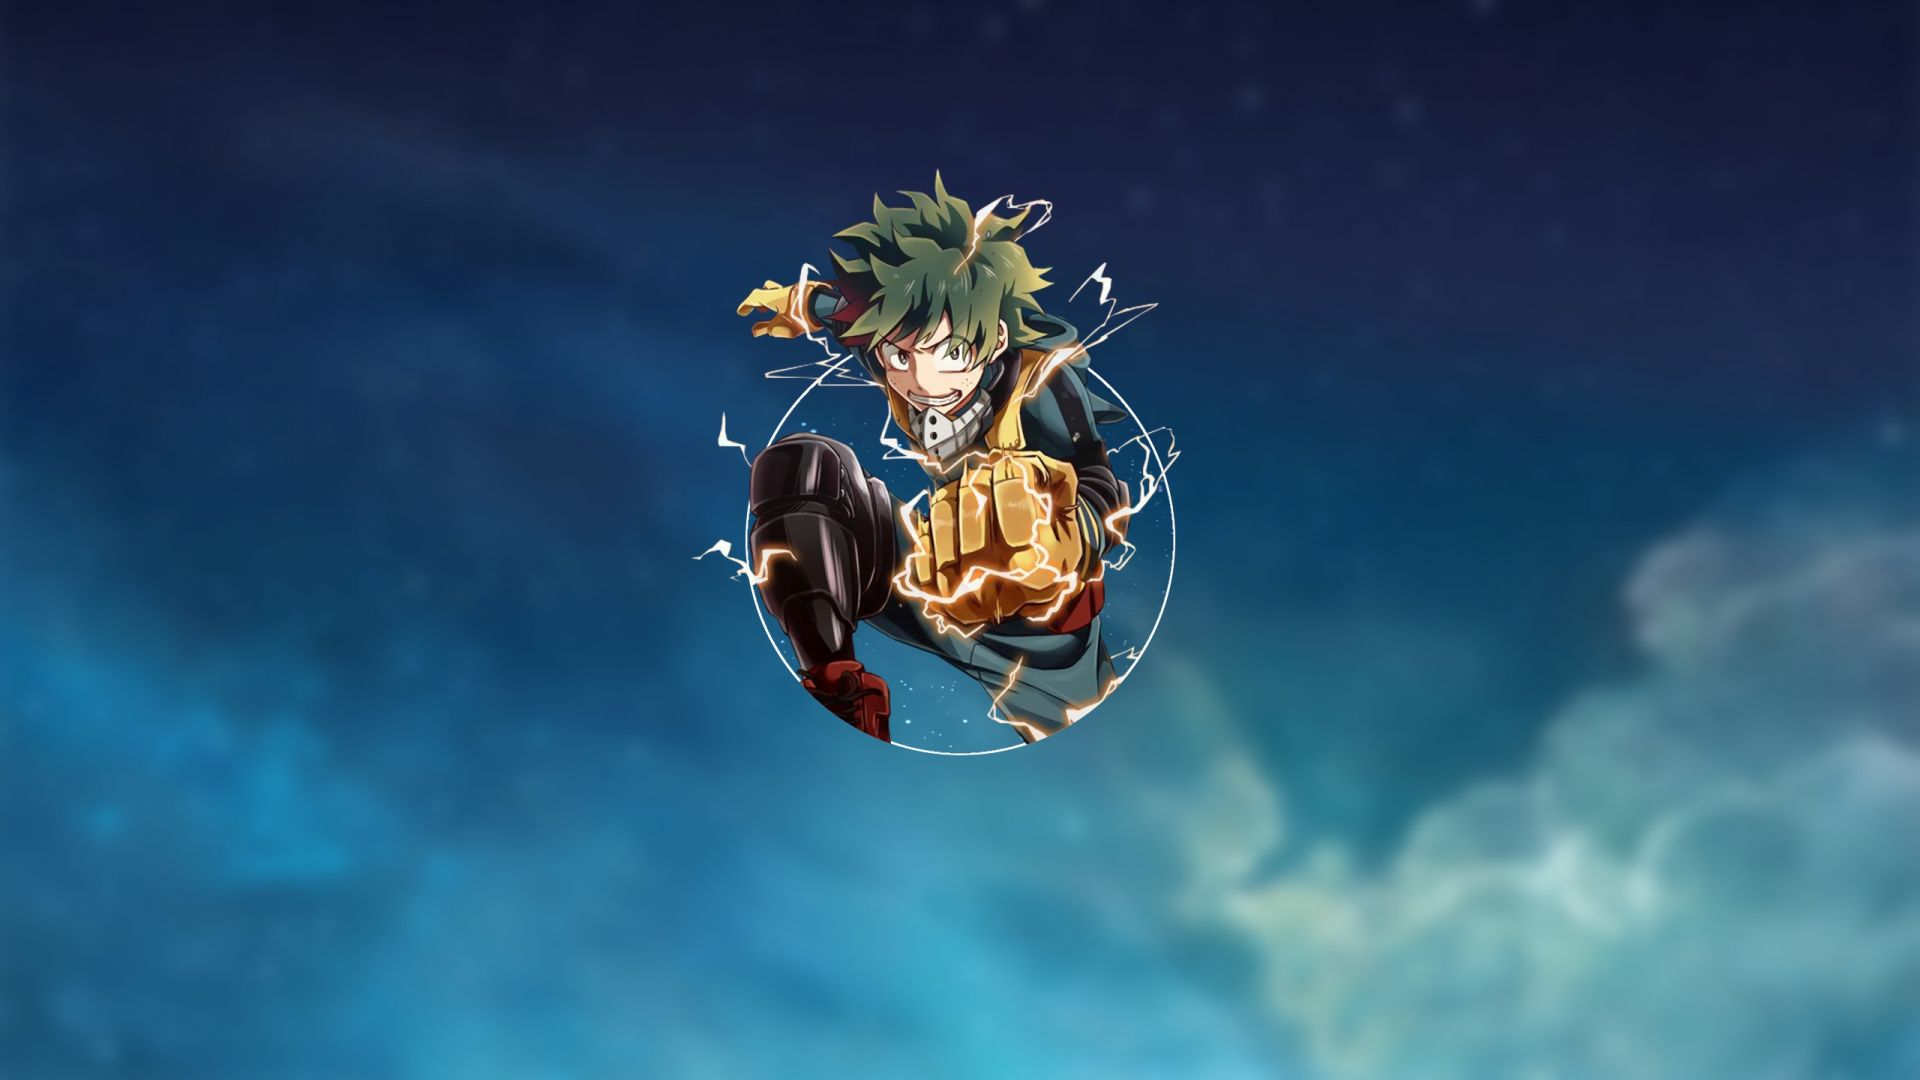 Desktop Wallpaper Izuku Midoriya, My Hero Academia, Anime, Anime Boy, Hd Image, Picture ...